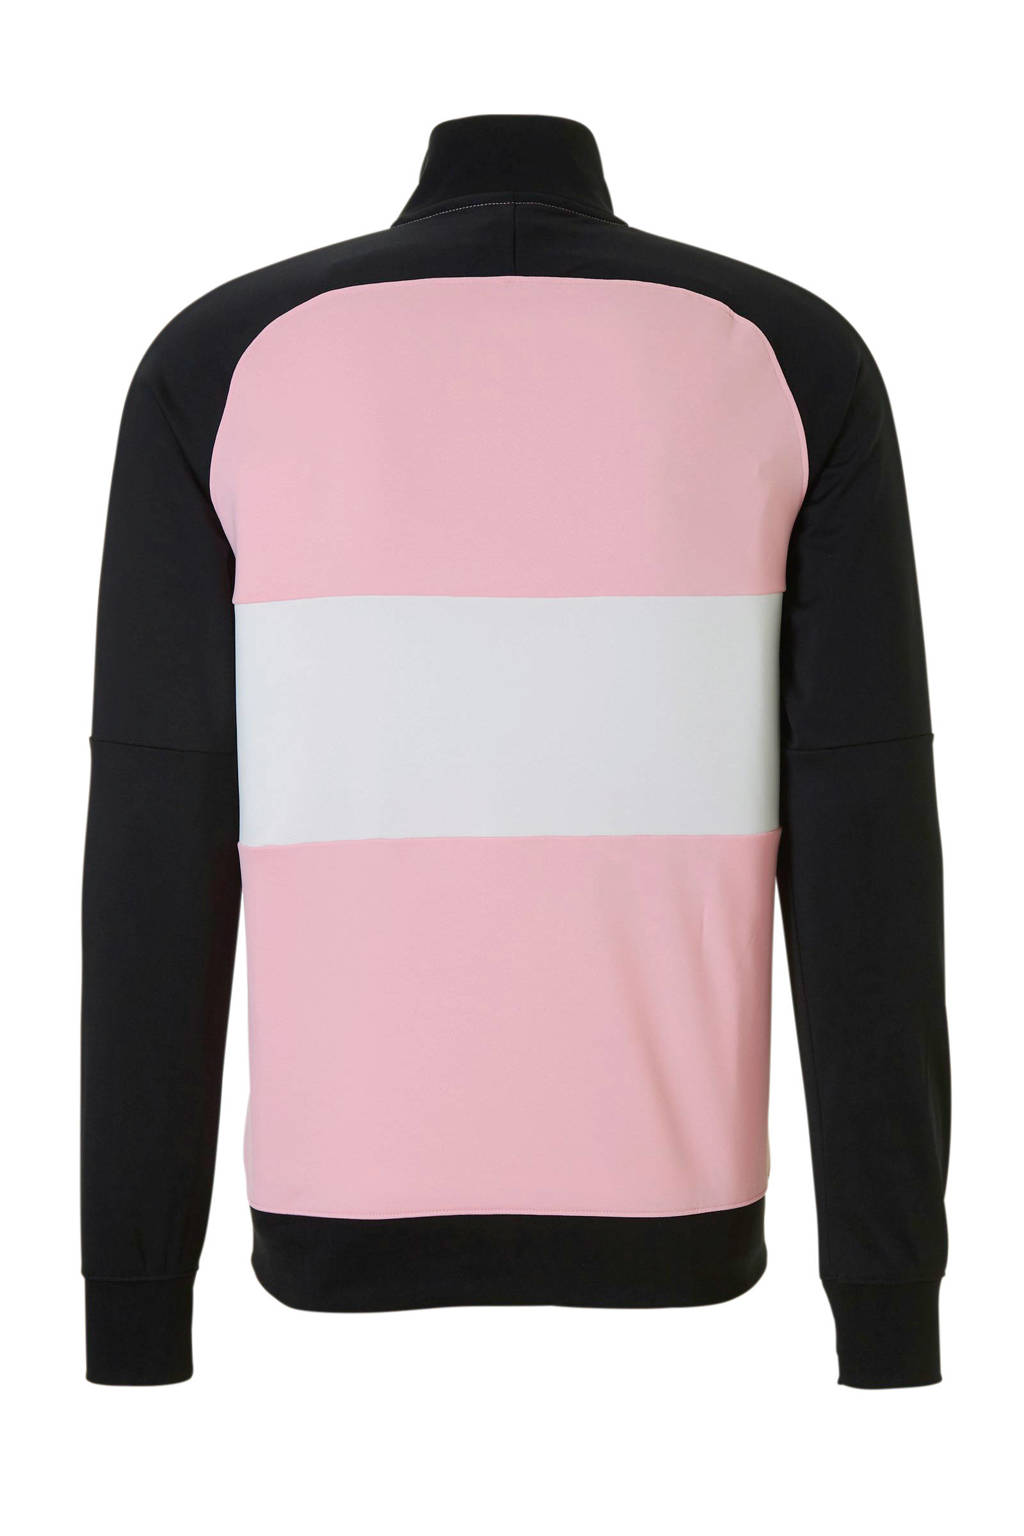 Nike   sportvest zwart/roze/wit, Zwart/roze/wit